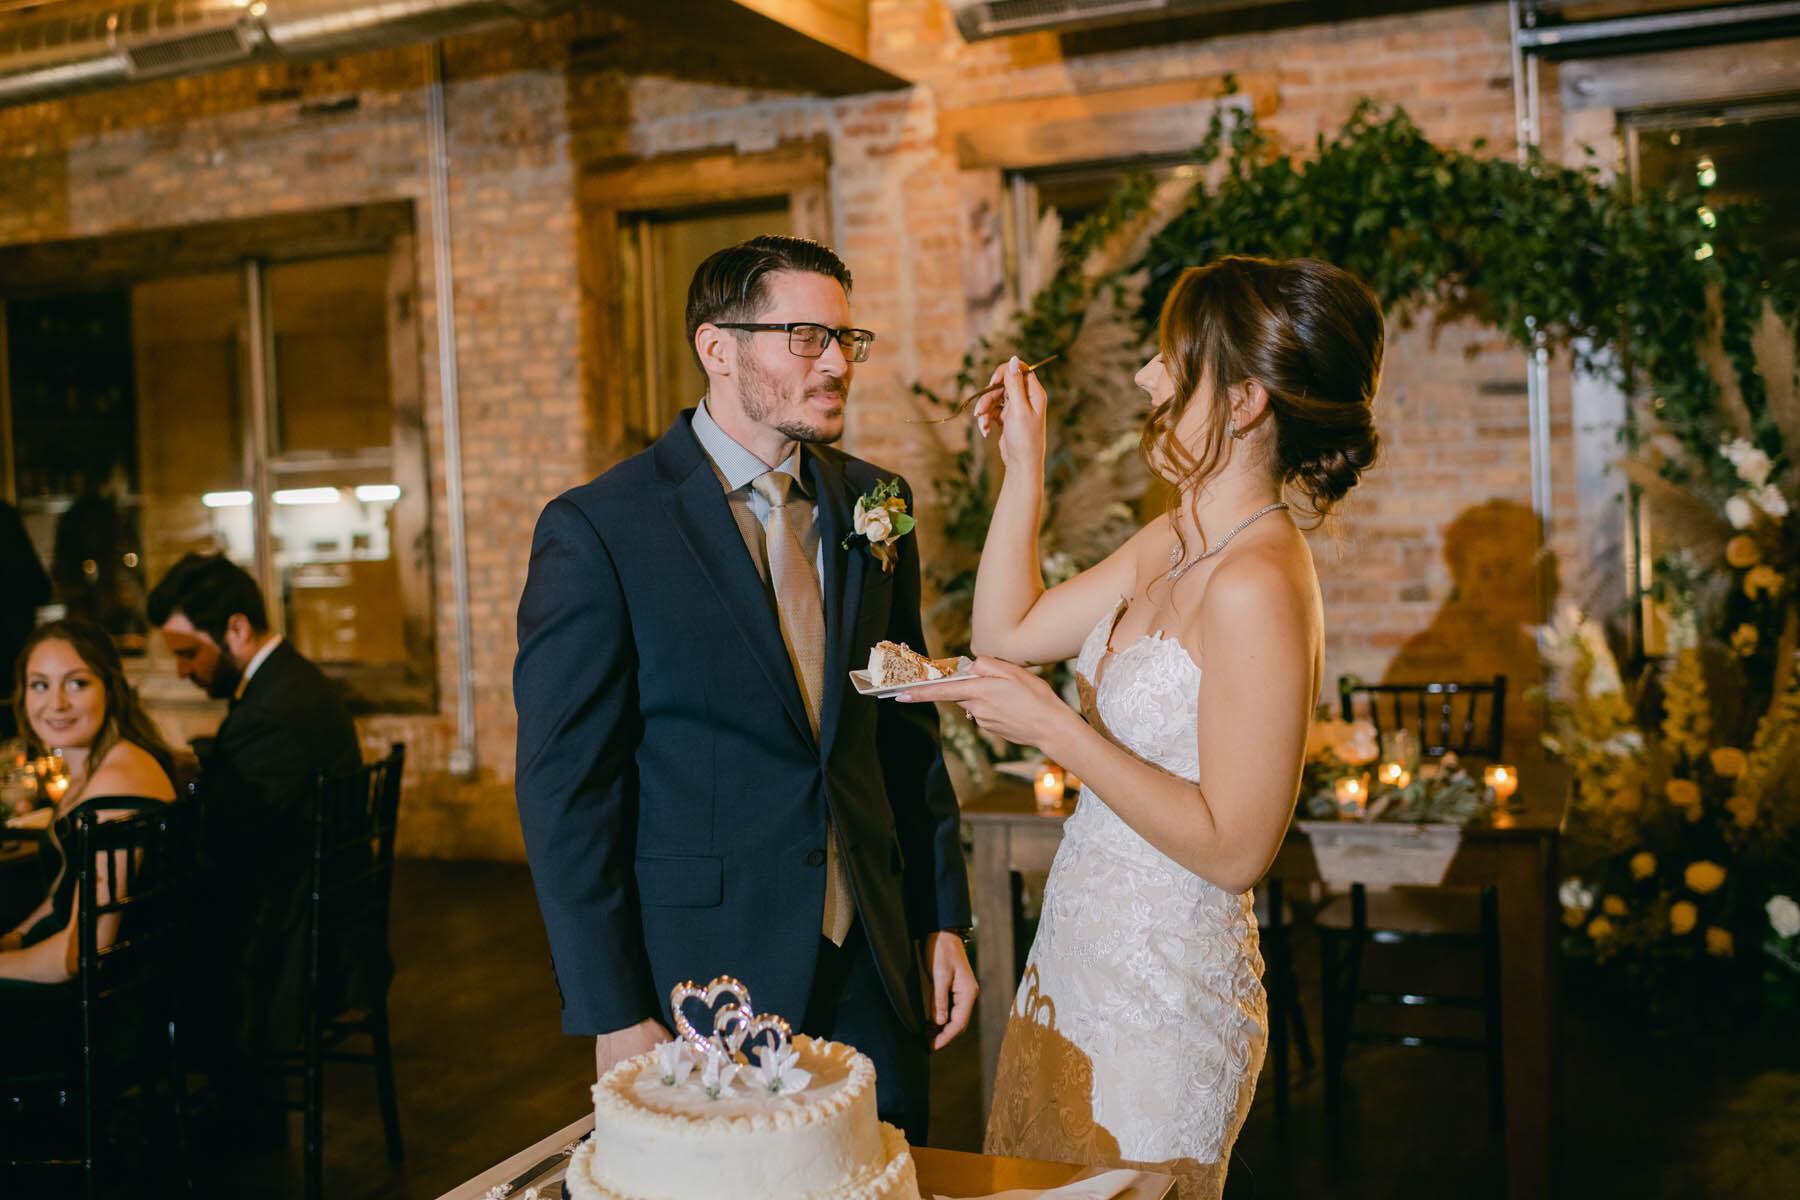 bride + groom cutting cake